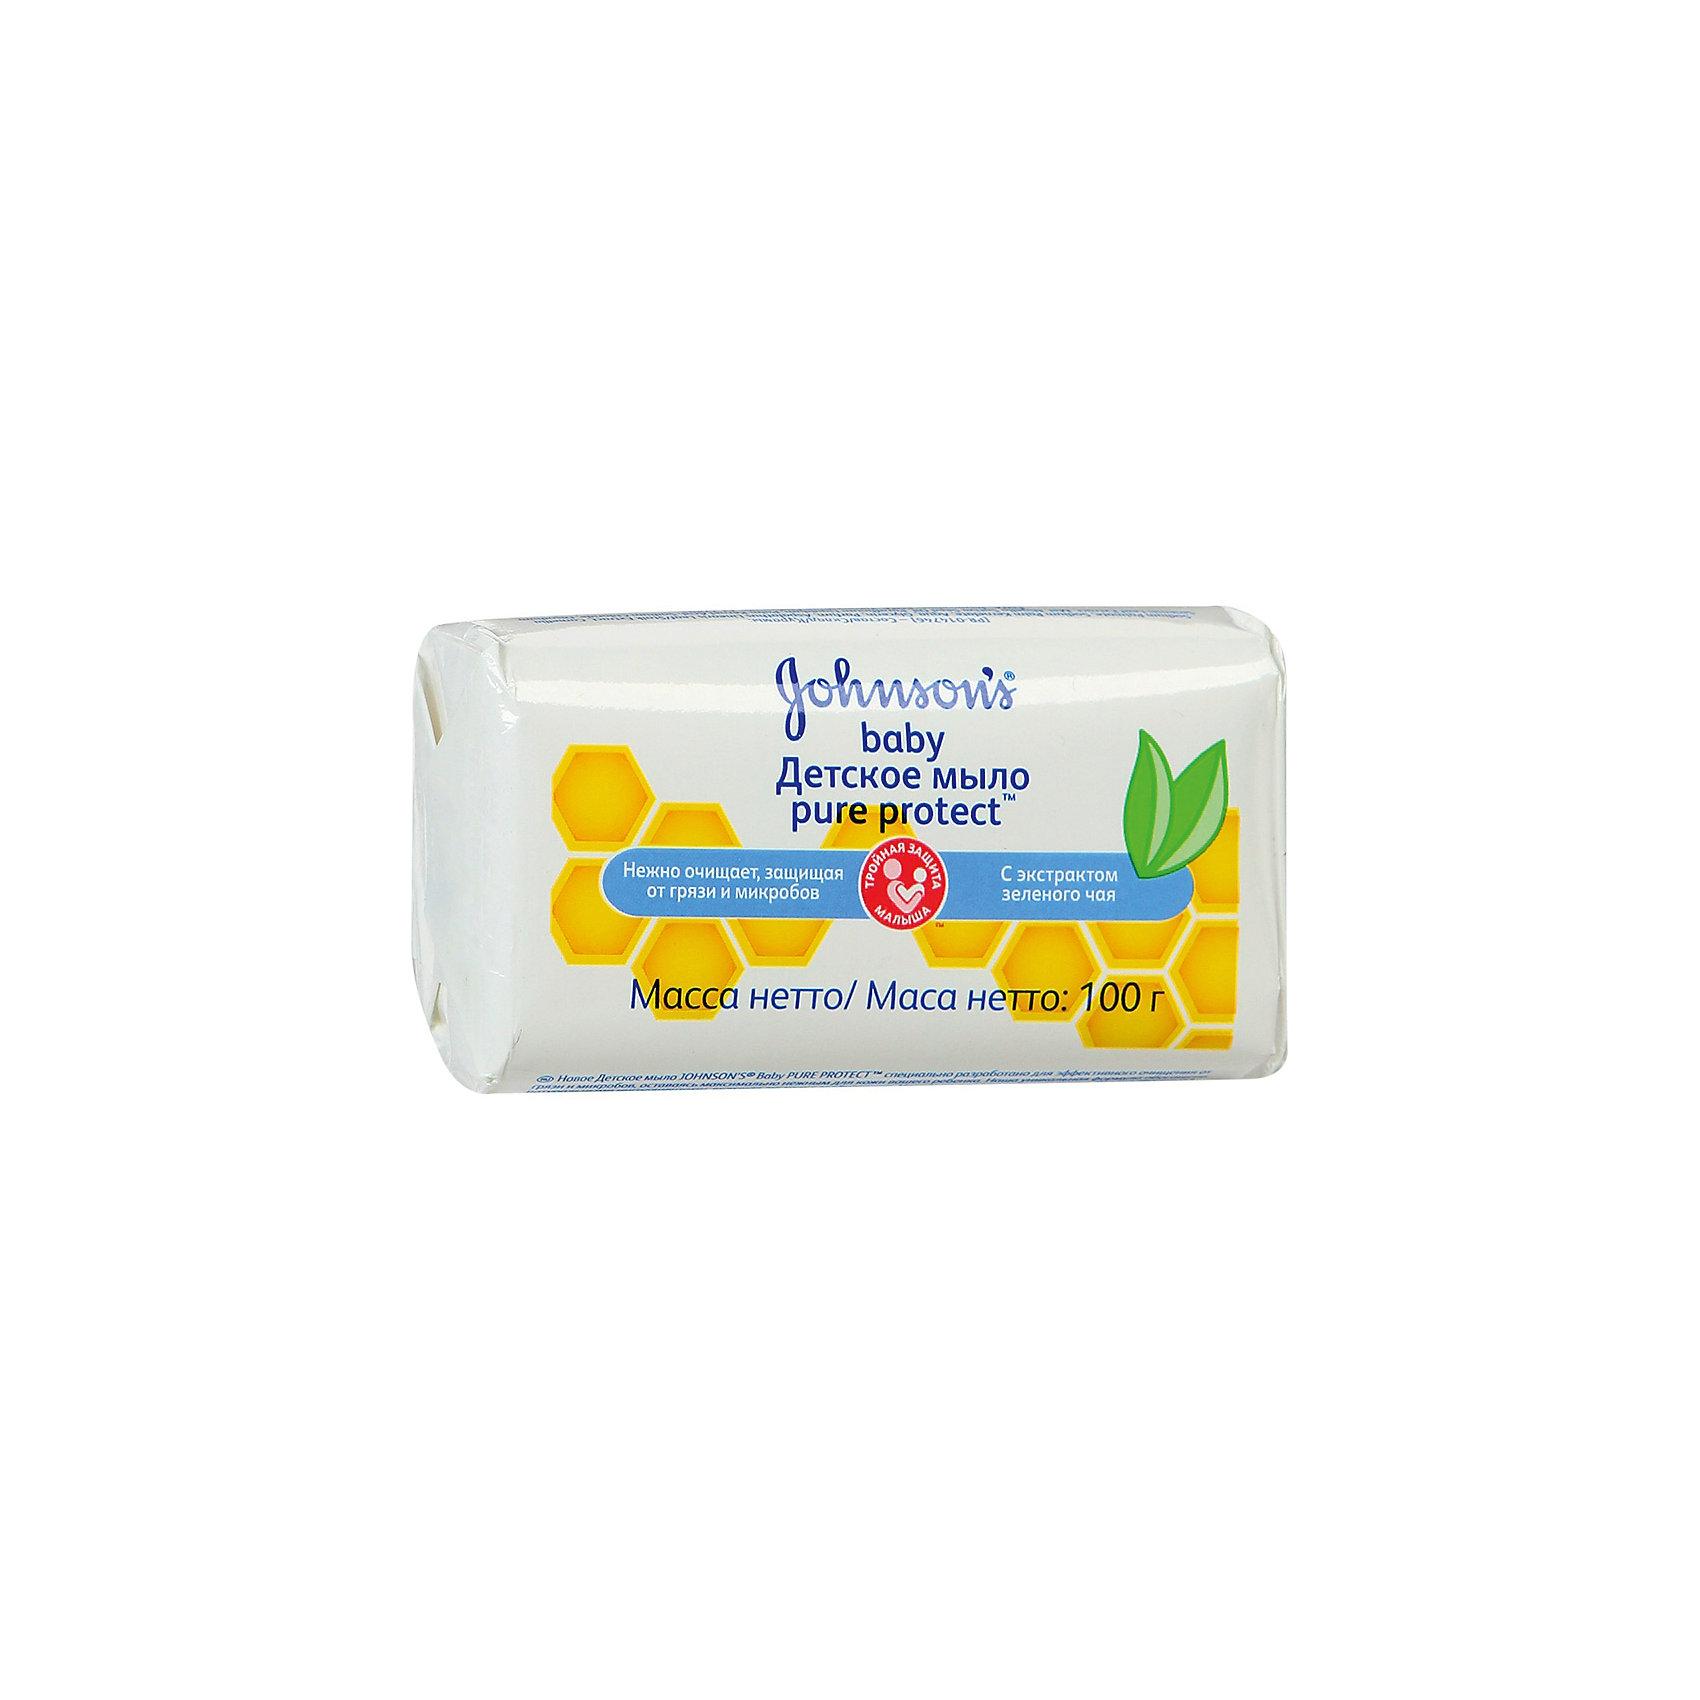 Детское мыло Pure Protect 100 гр , Johnsons baby